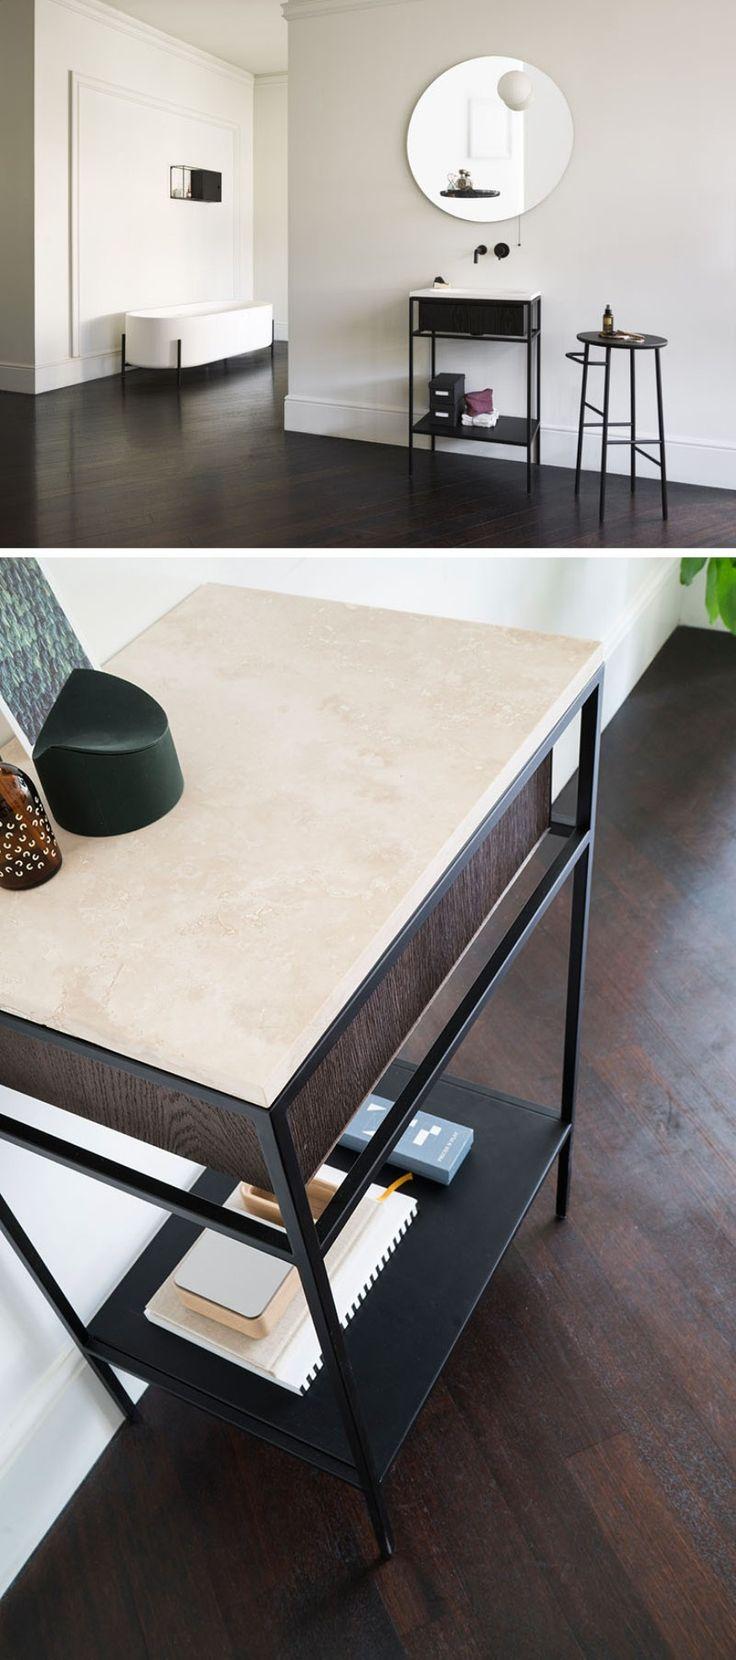 299 best Badezimmer-Designs 2018 images on Pinterest | Bathroom ...